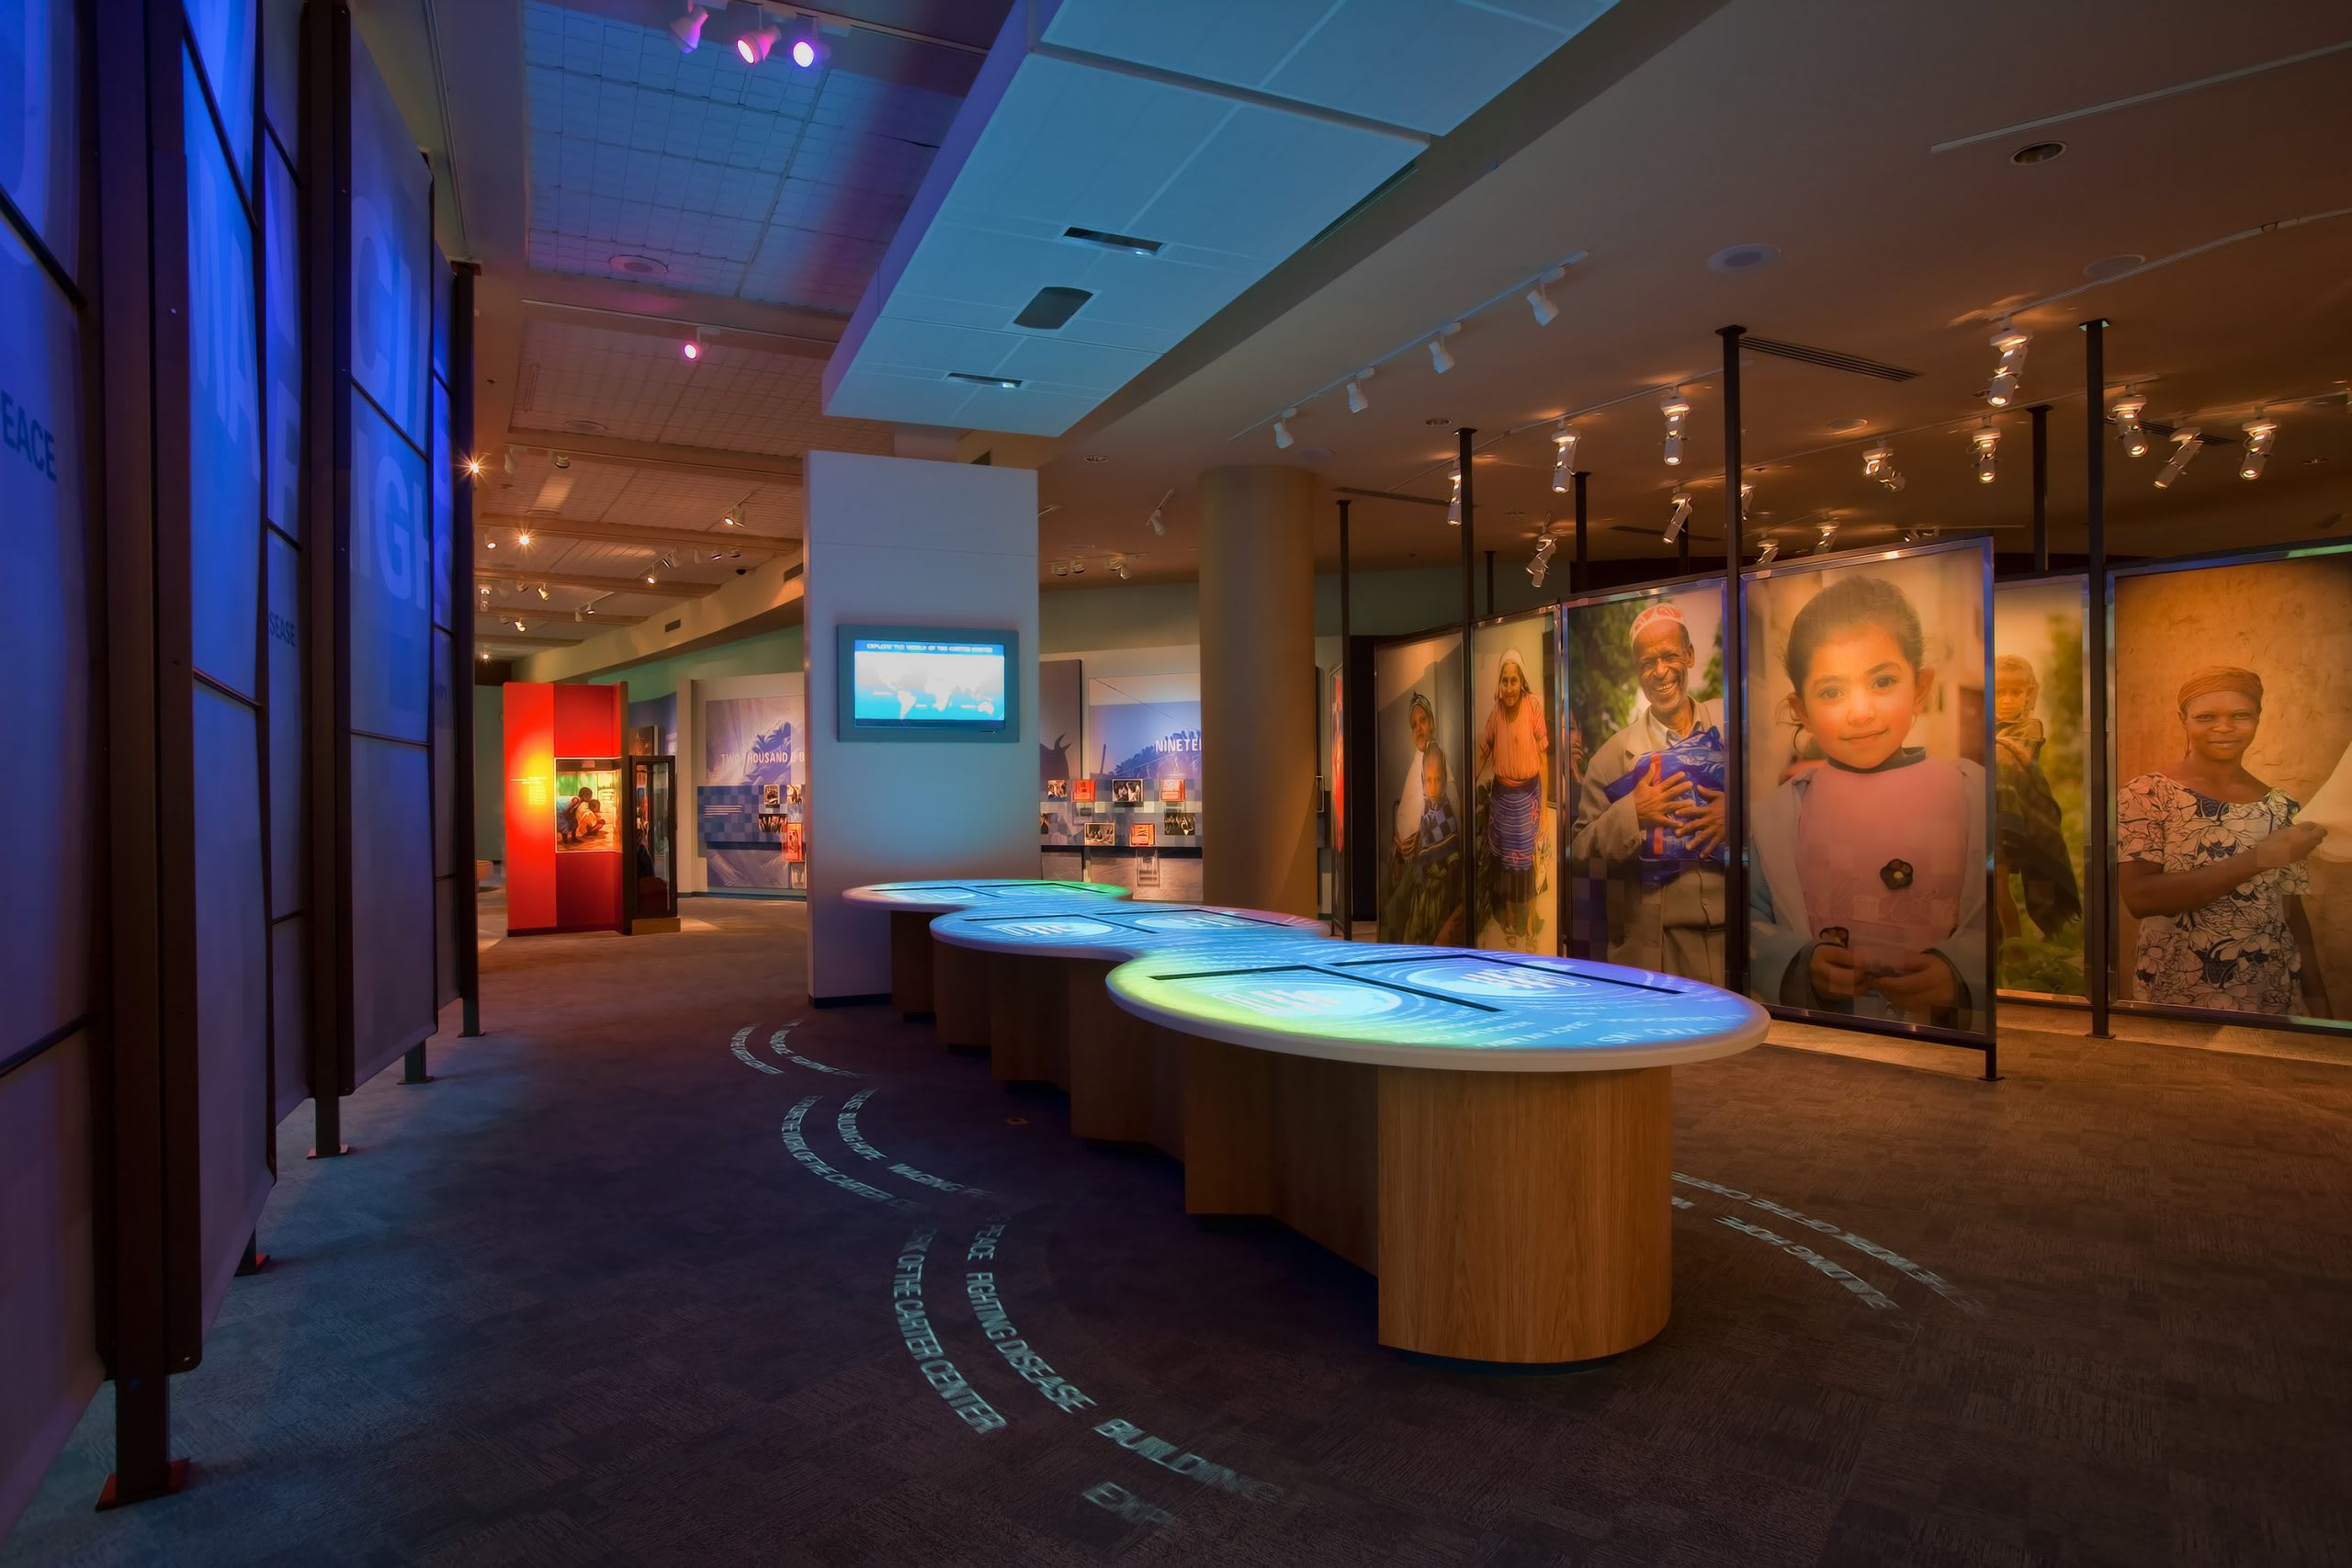 Jimmy Carter Museum displays